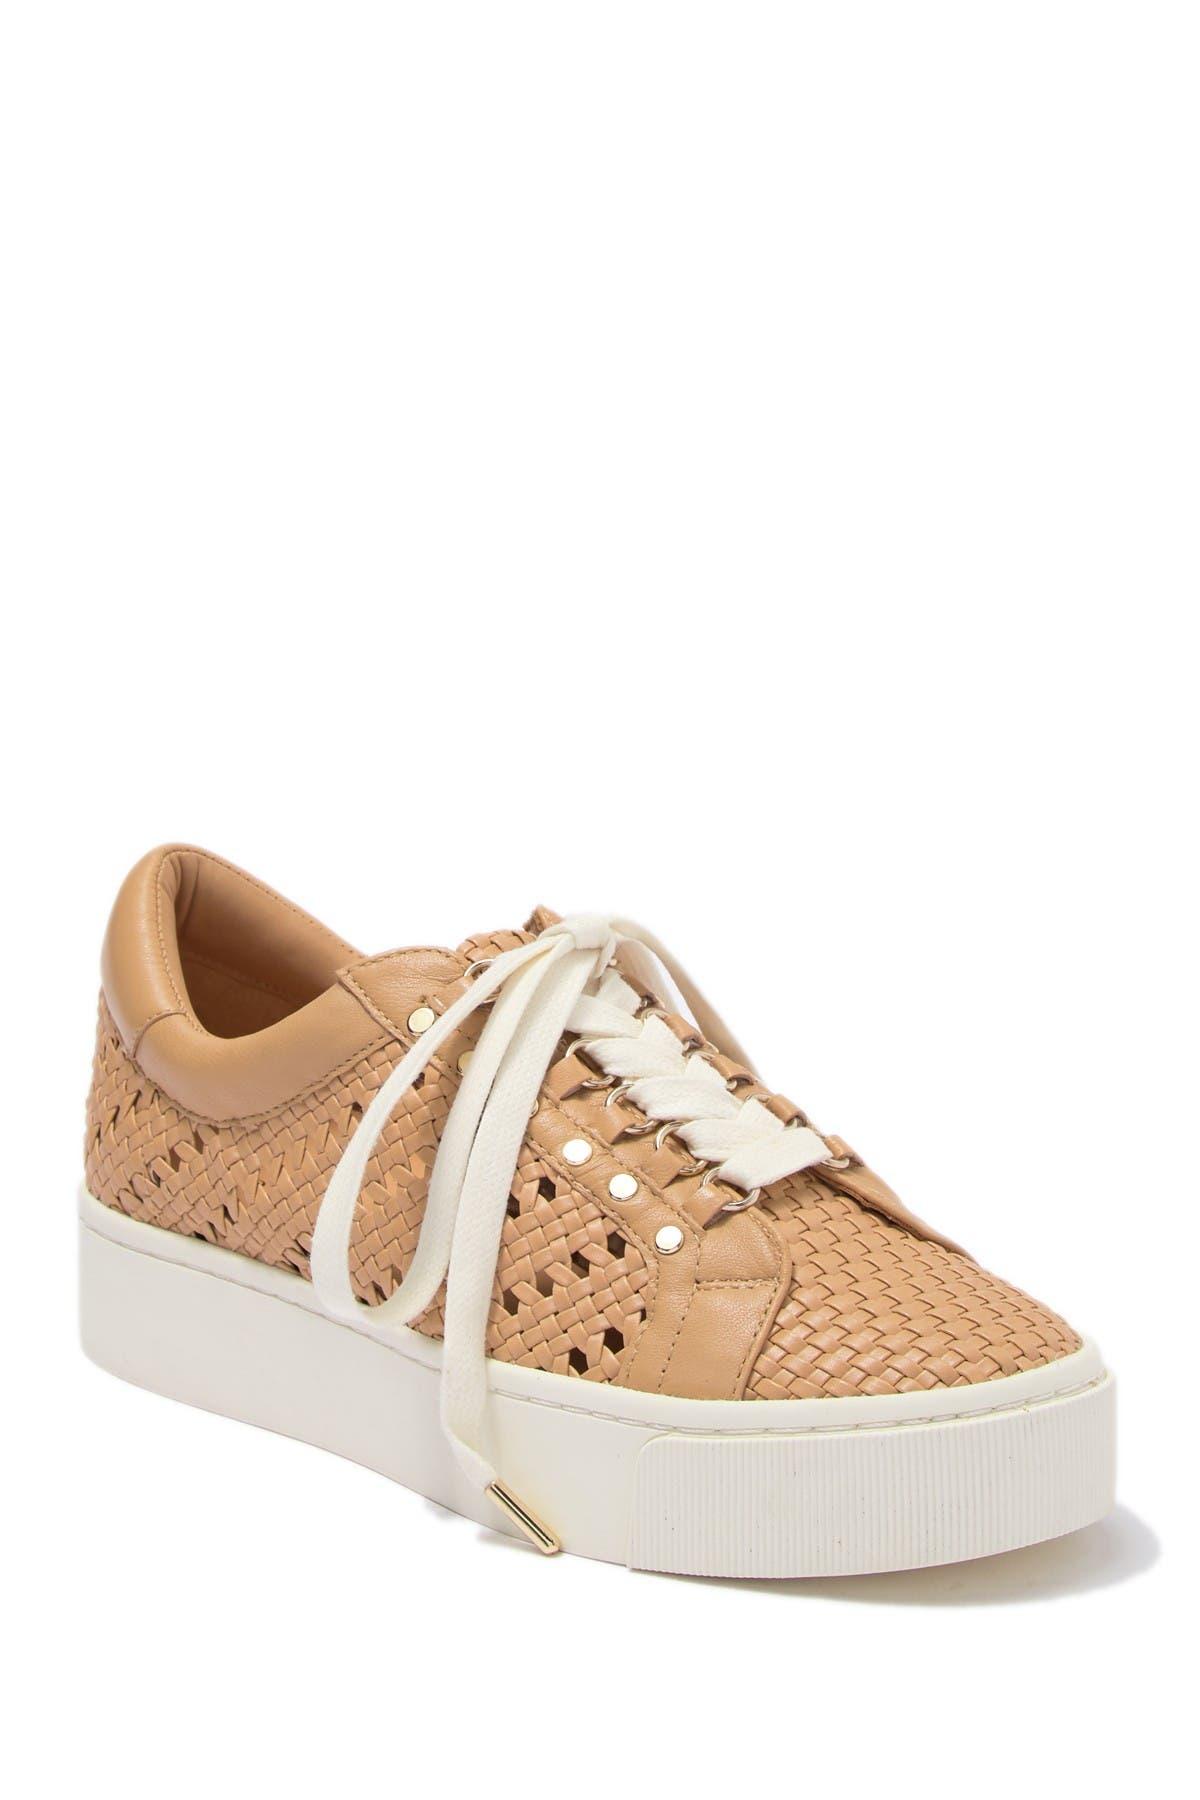 Joie | Handan Woven Platform Sneaker